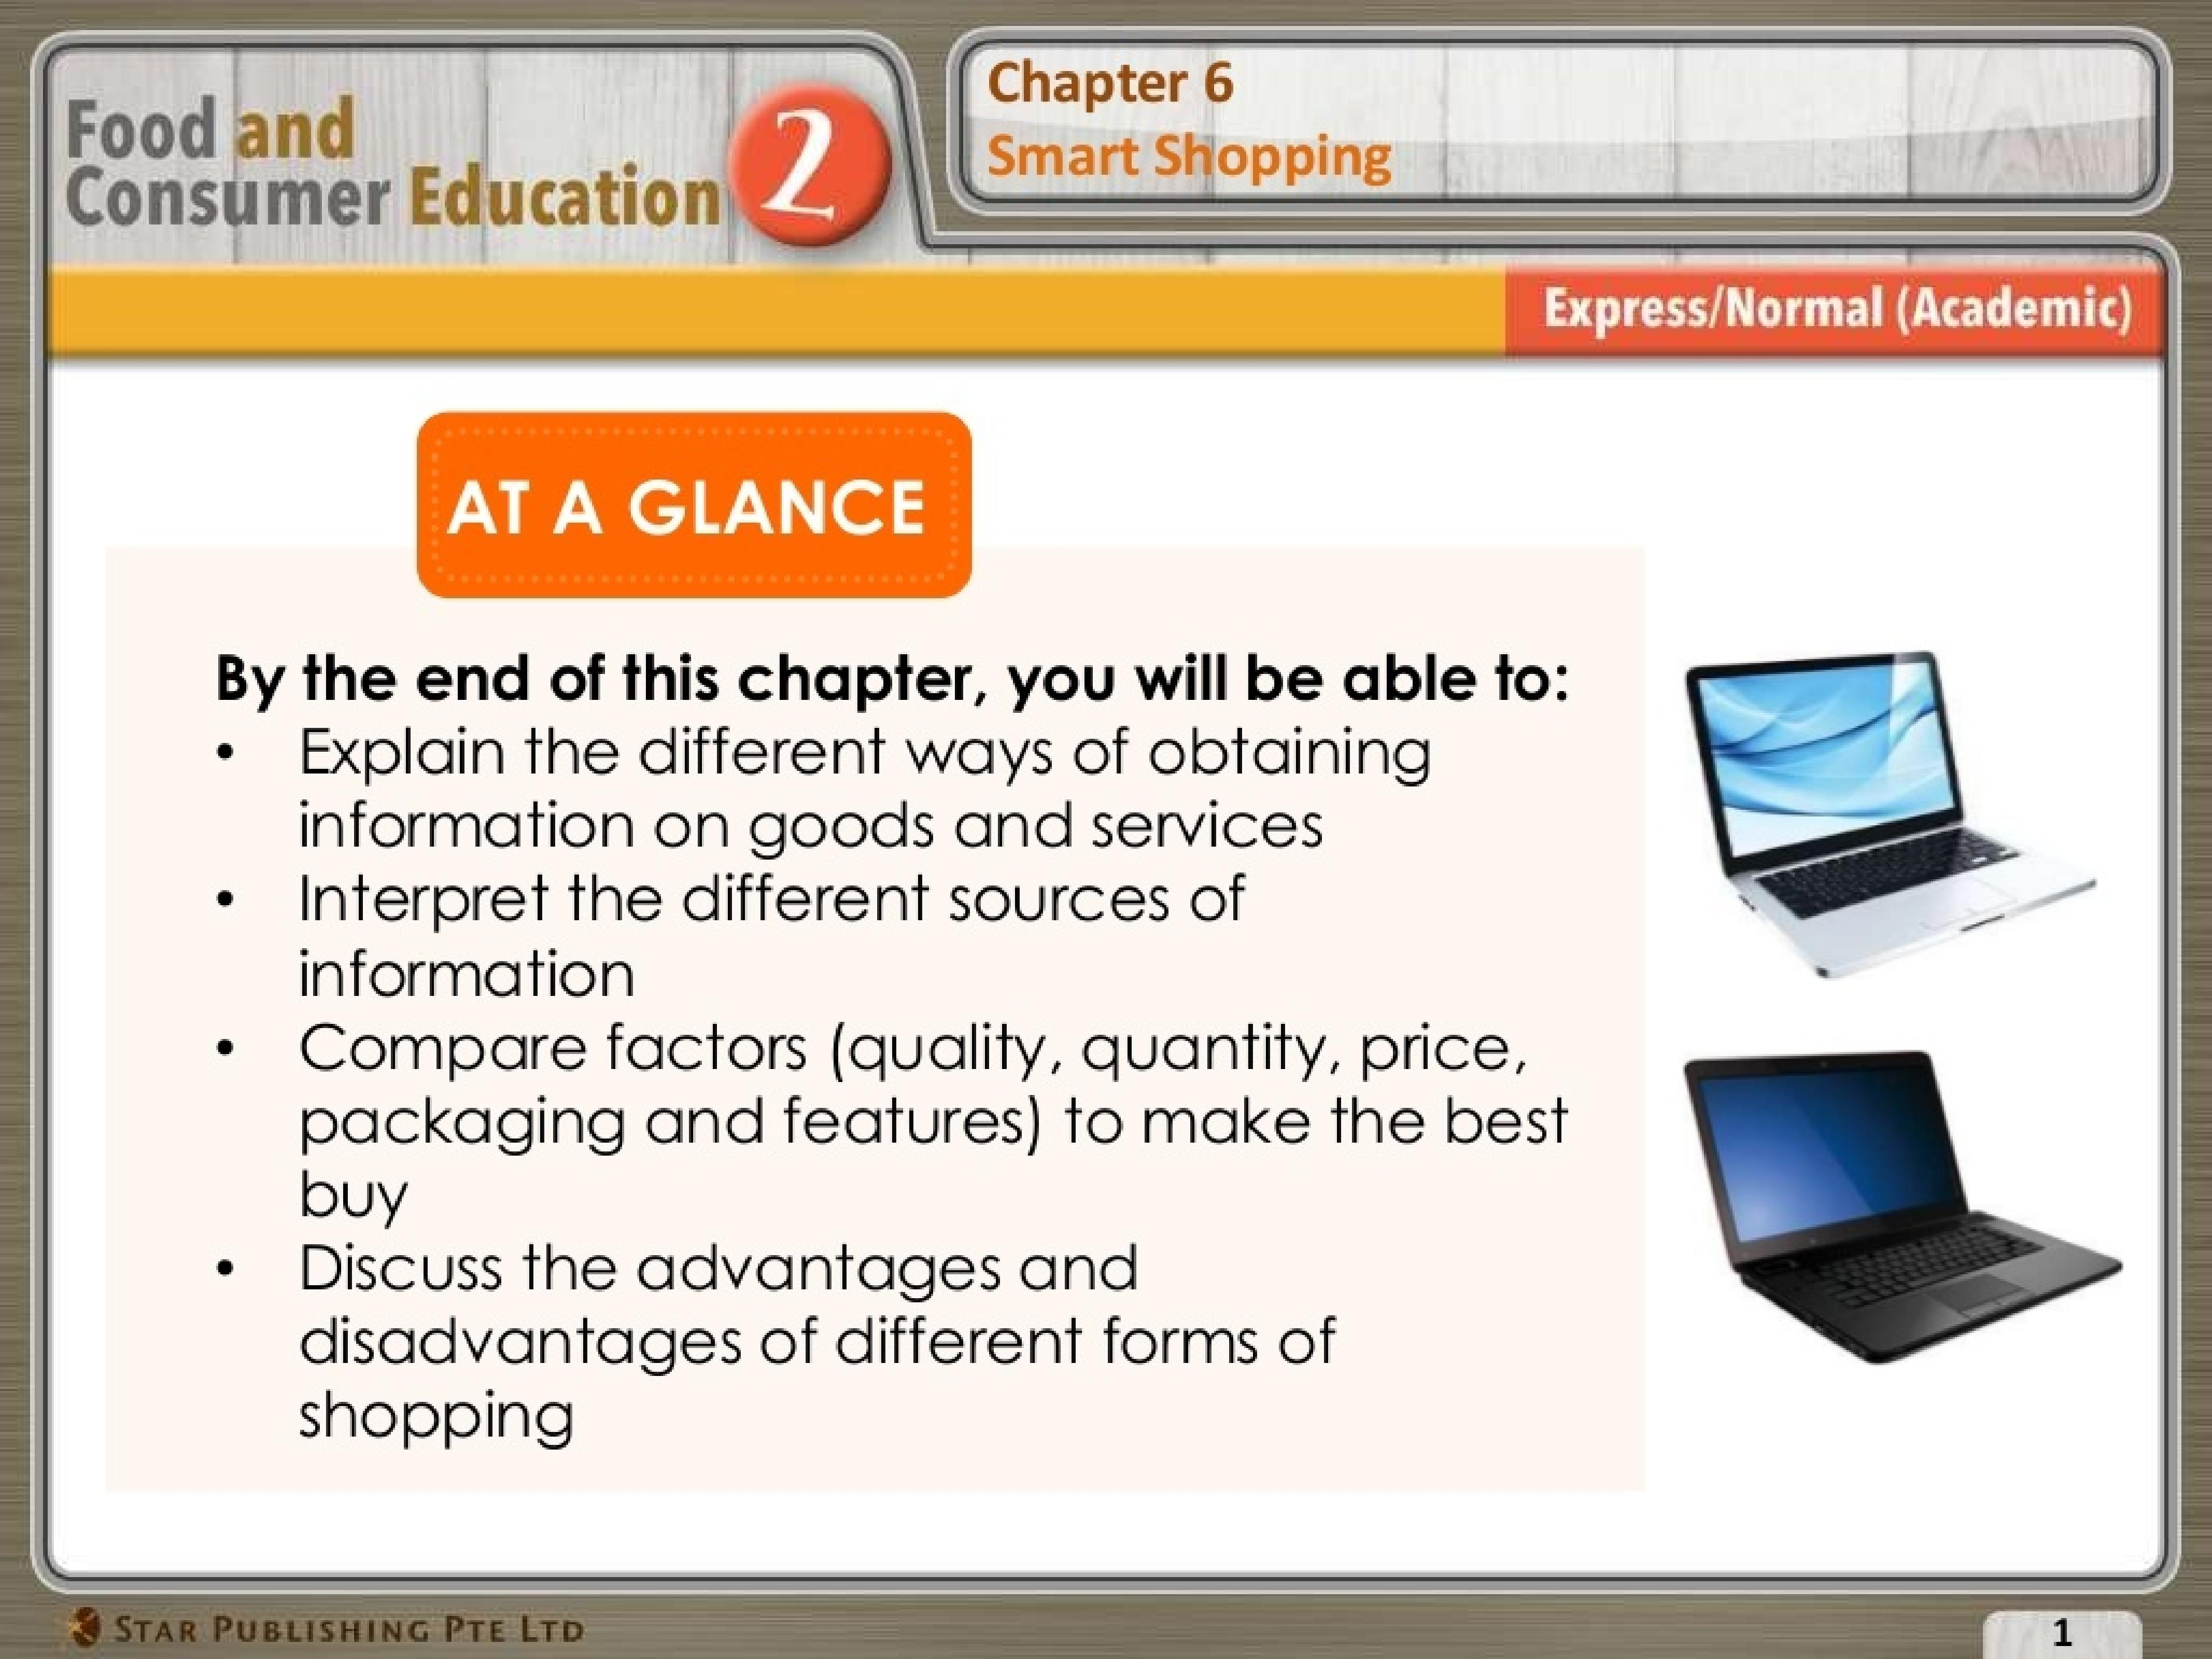 (Sec 2 FCE) Smart Shopping